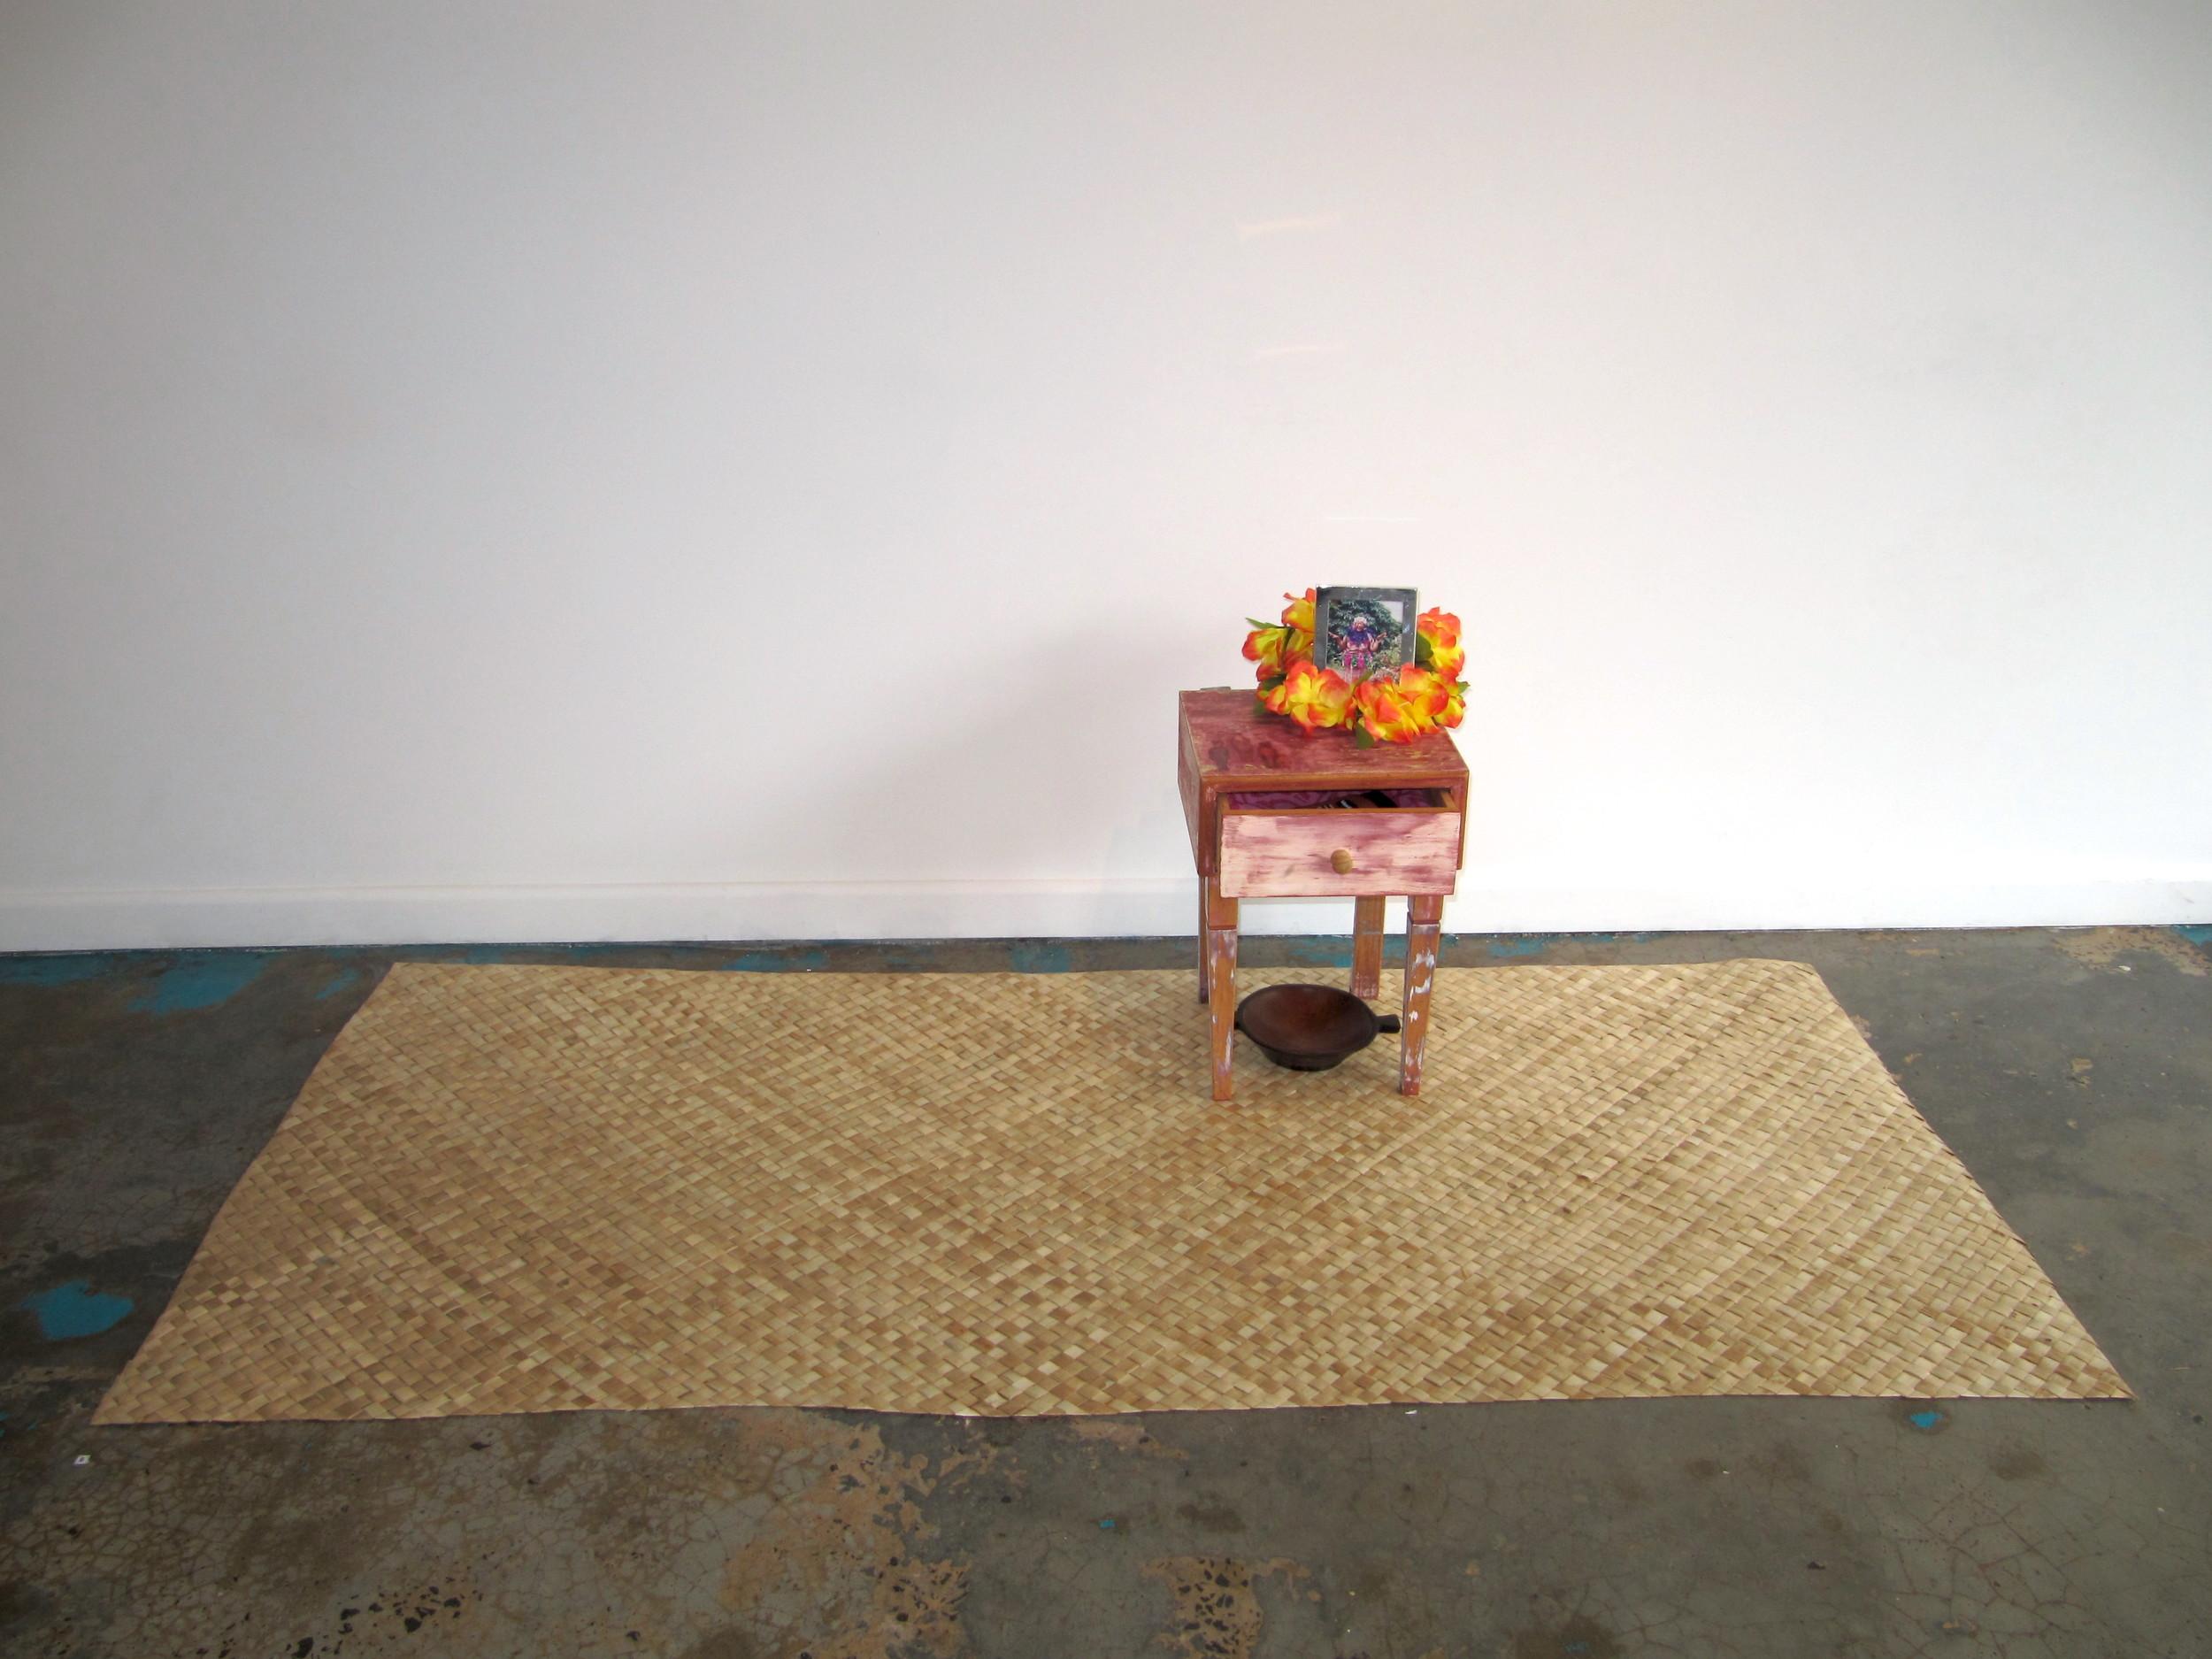 'O 'ie fala mo la'u tinā Nātia | Fine mats for my grandma Nātia, Léuli Eshraghi, pandanus mat, wooden table, tānoa kava bowl, photo frame, 'ula lei, cacao cream, 'ie lavalava, 2012